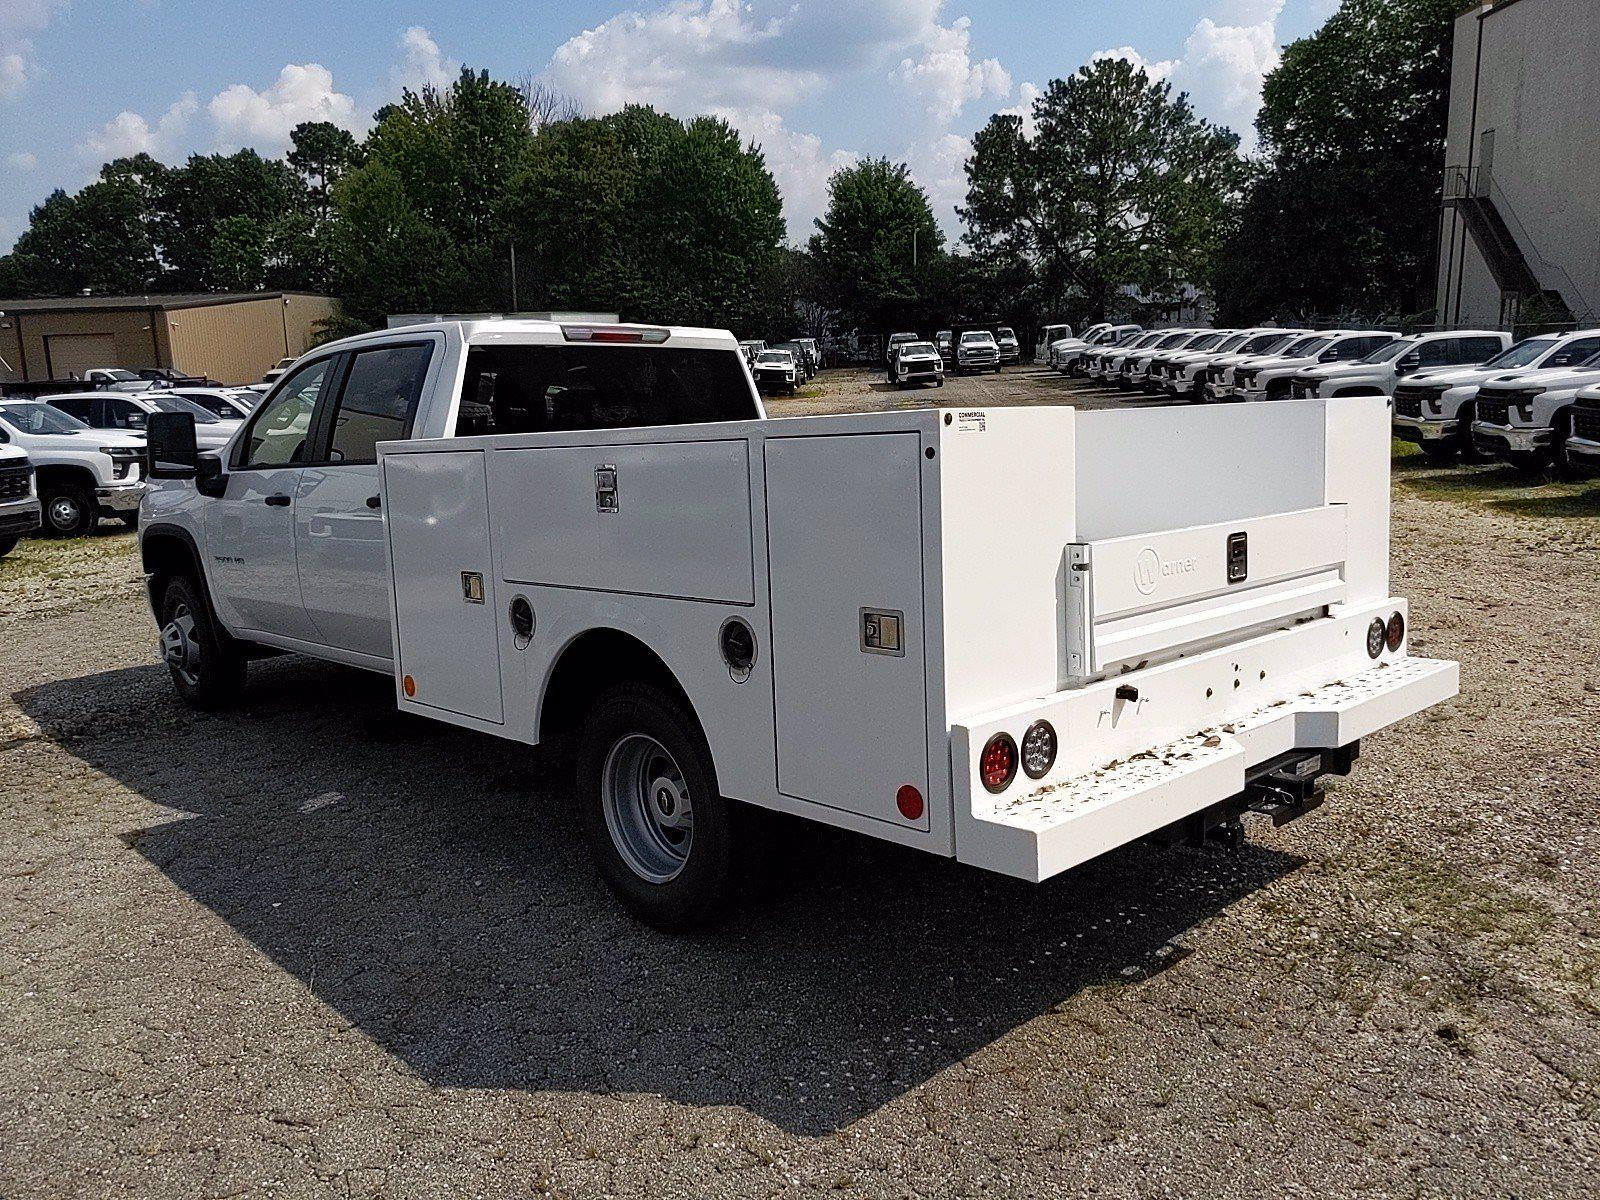 2021 Silverado 3500 Crew Cab 4x2,  Warner Truck Bodies Service Body #351042 - photo 2